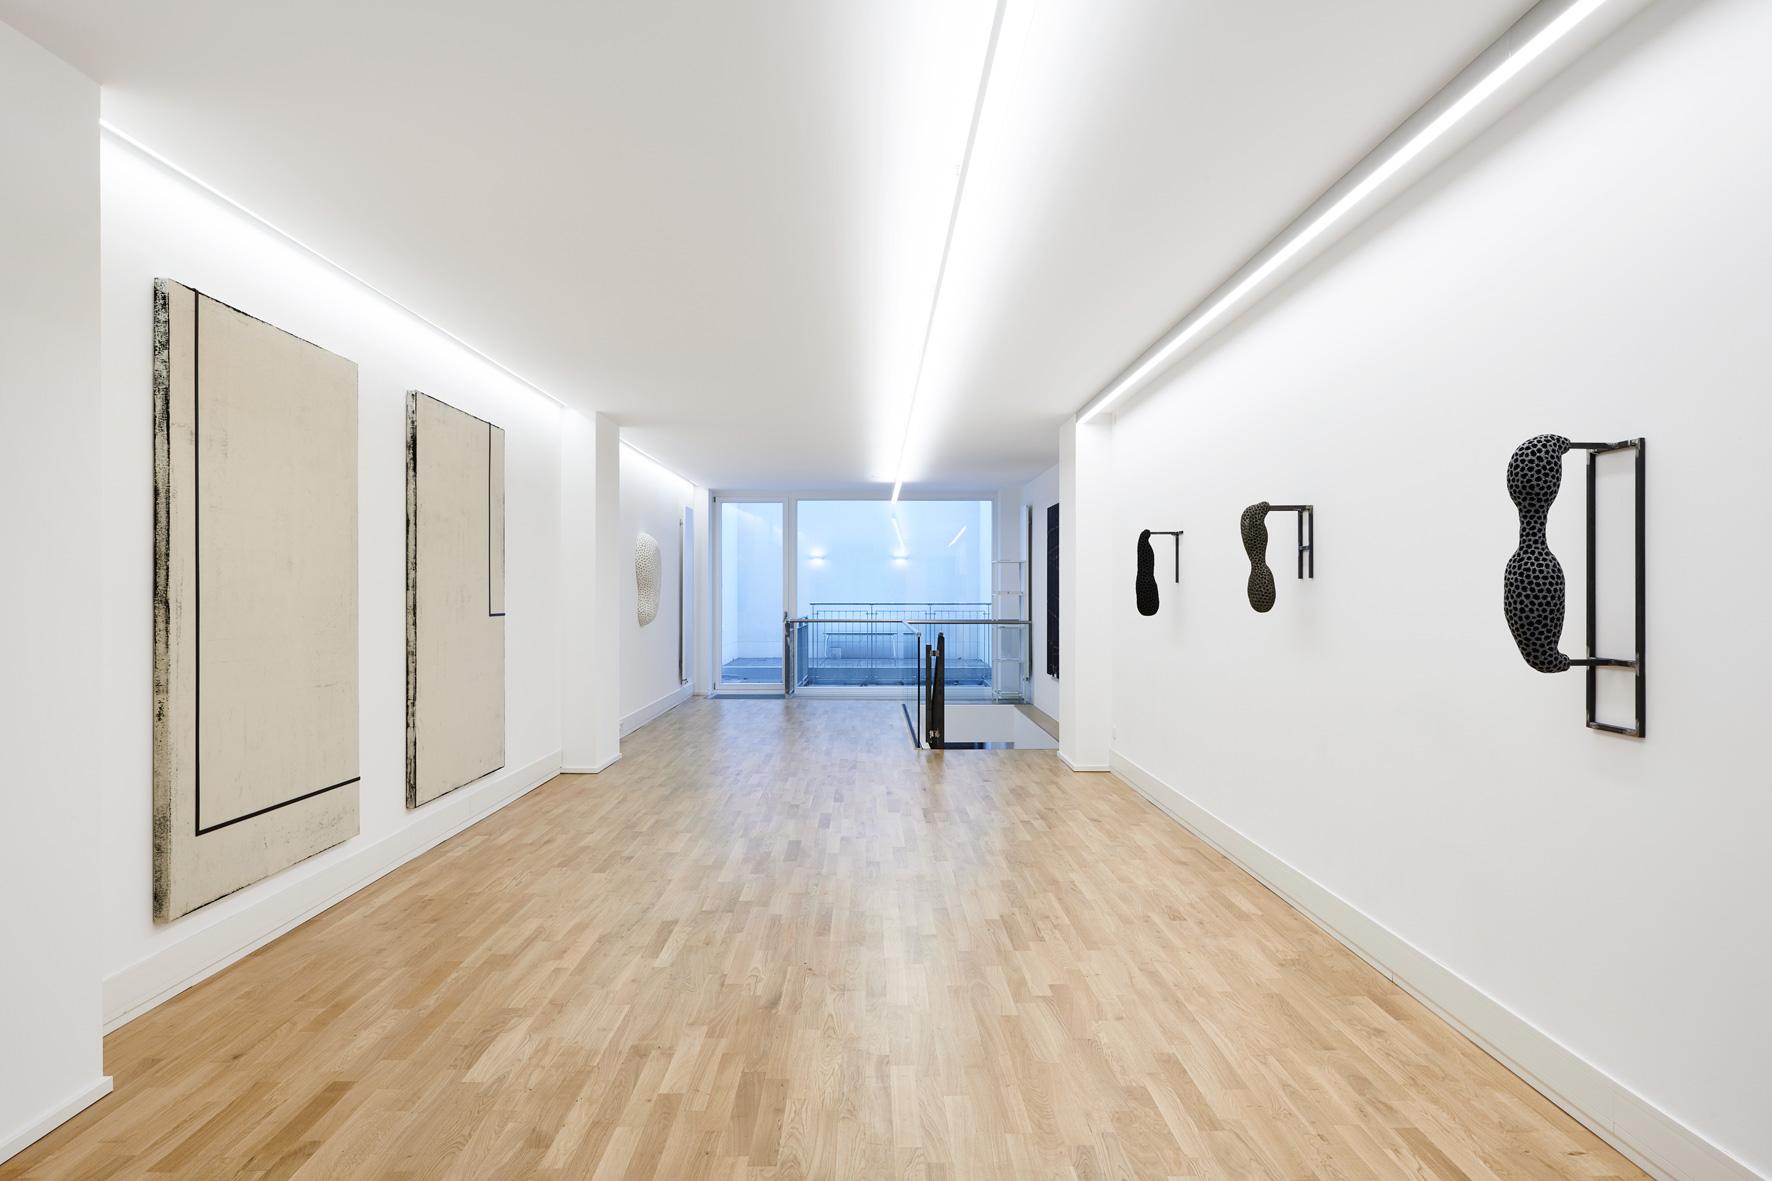 2019.01.08_Galerie-Alber-15_Mareike Tocher_web.jpg